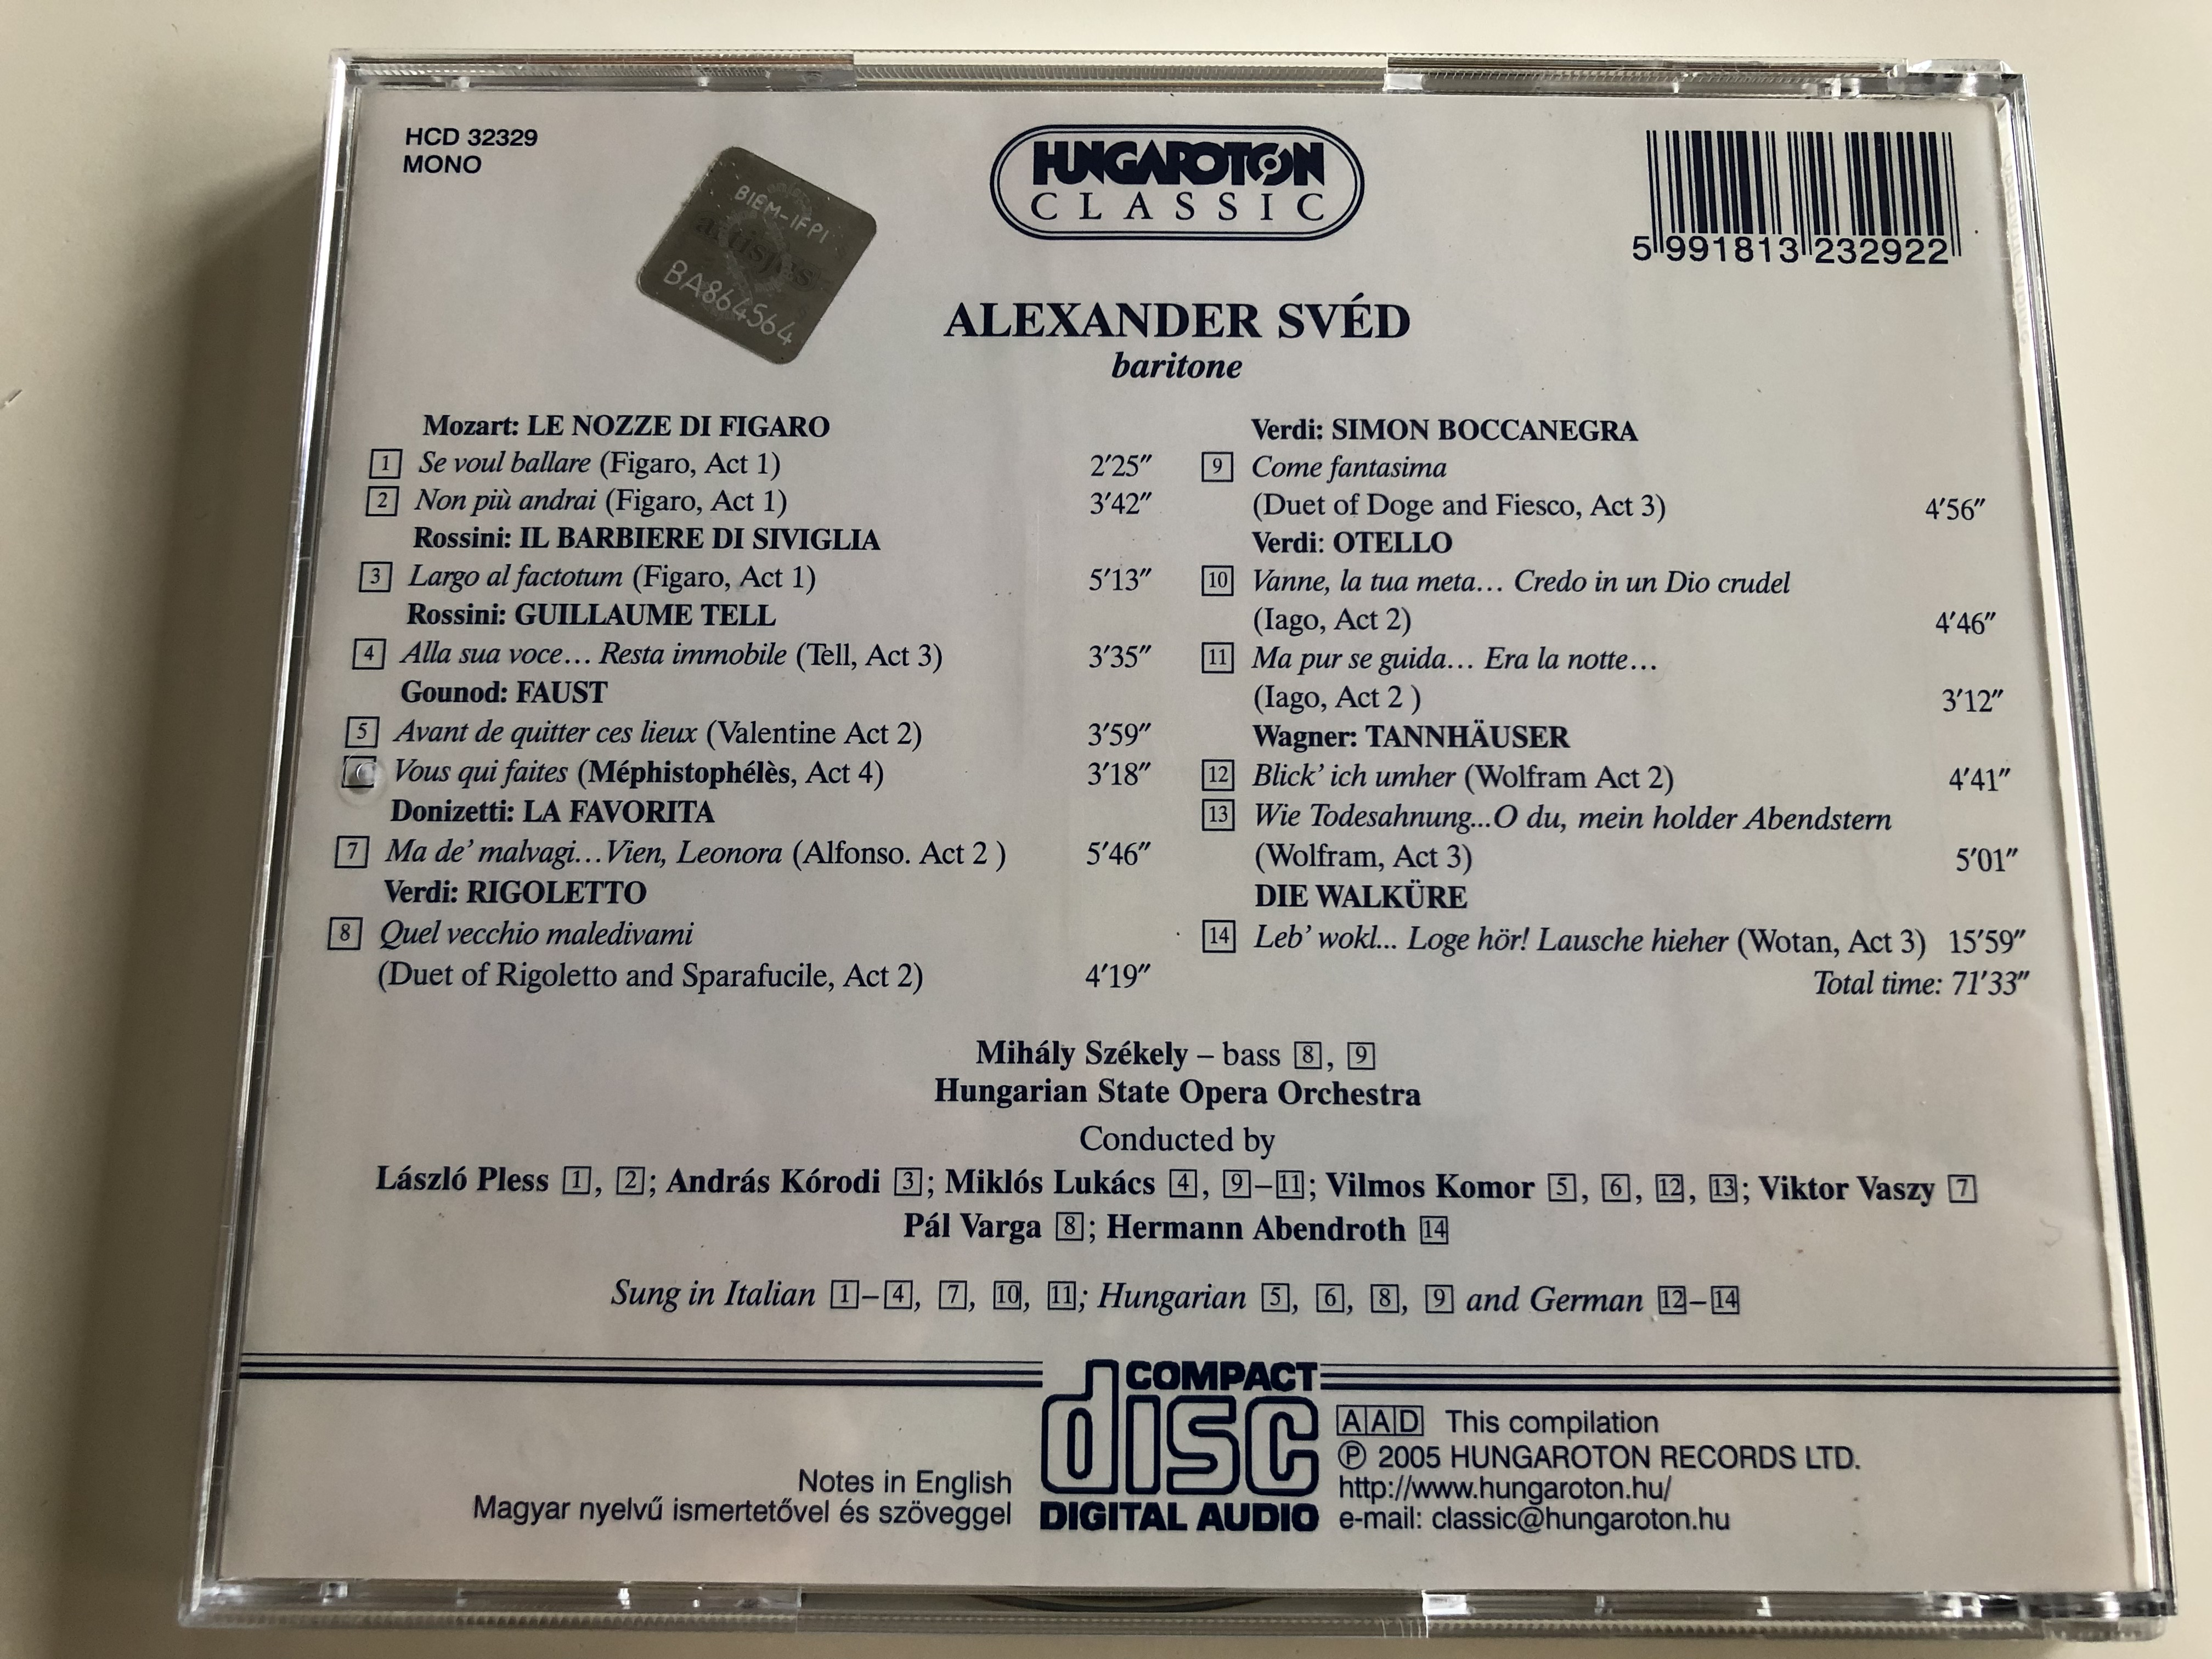 alexander-sv-d-baritone-audio-cd-2005-mozart-rossini-gounod-donizetti-verdi-wagner-hungarian-state-opera-orchestra-hungaroton-classic-hcd-32329-7-.jpg